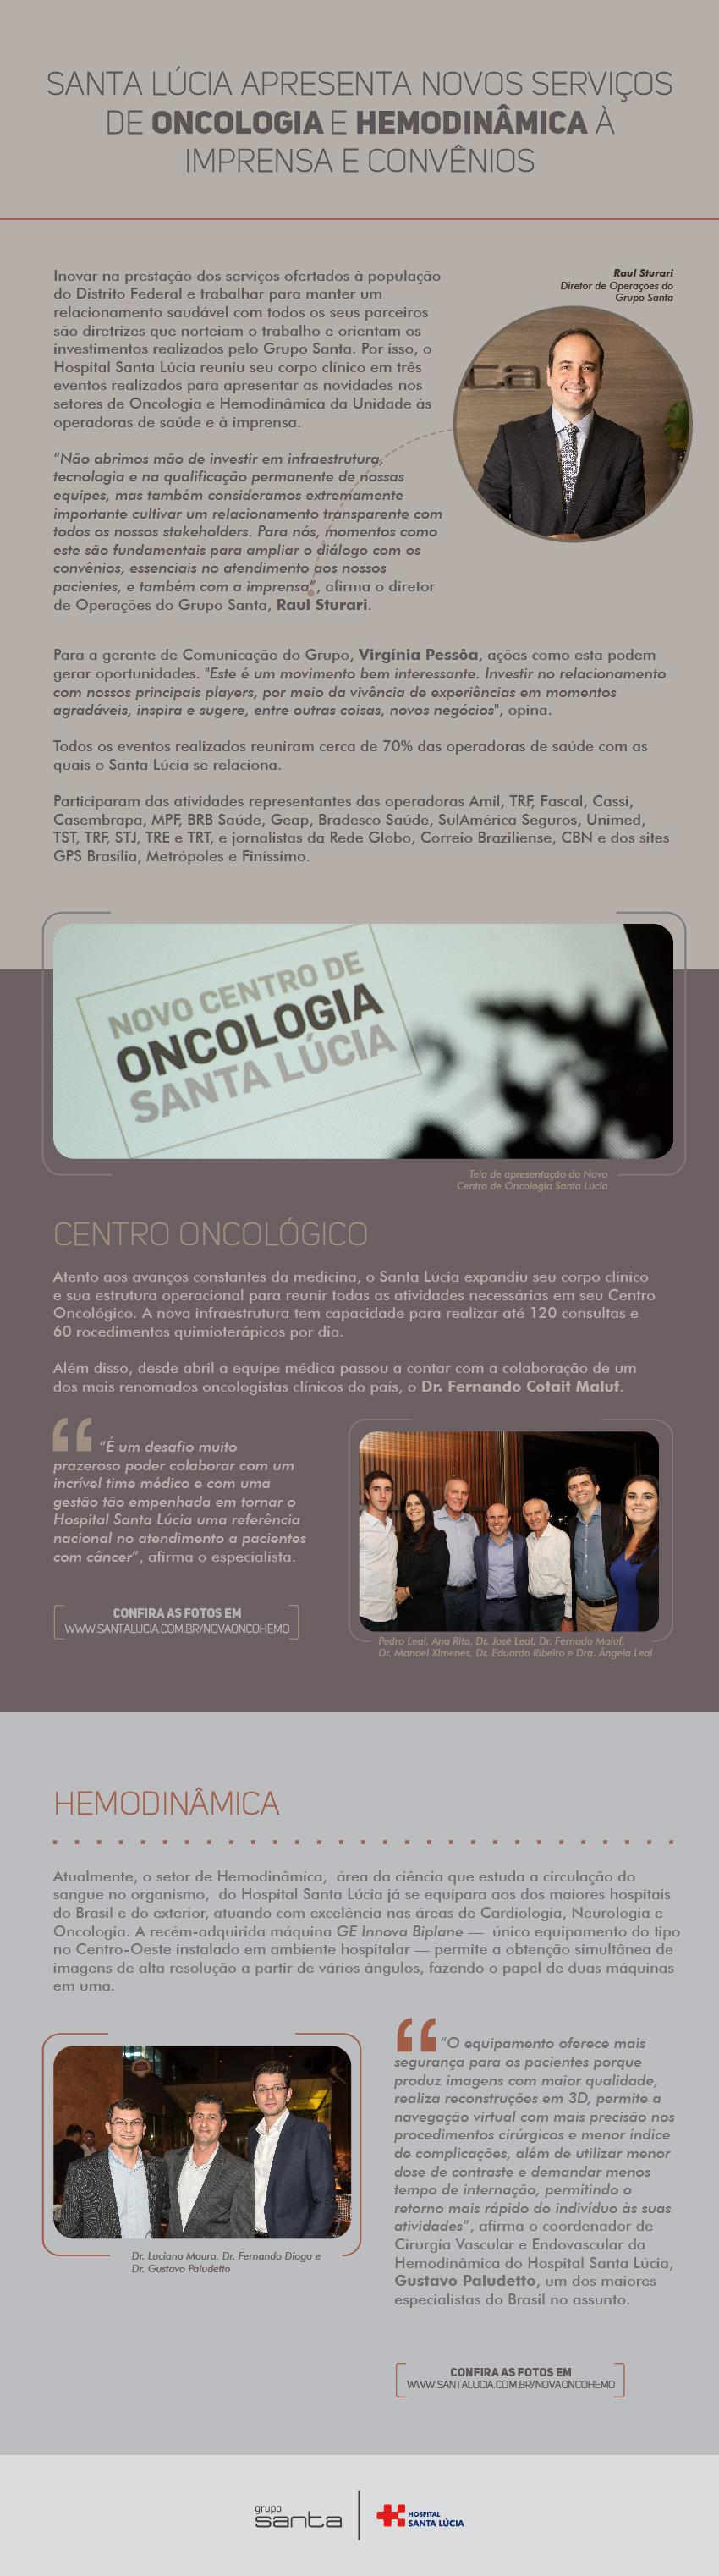 News_Oncologia_Hemodinâmica-01